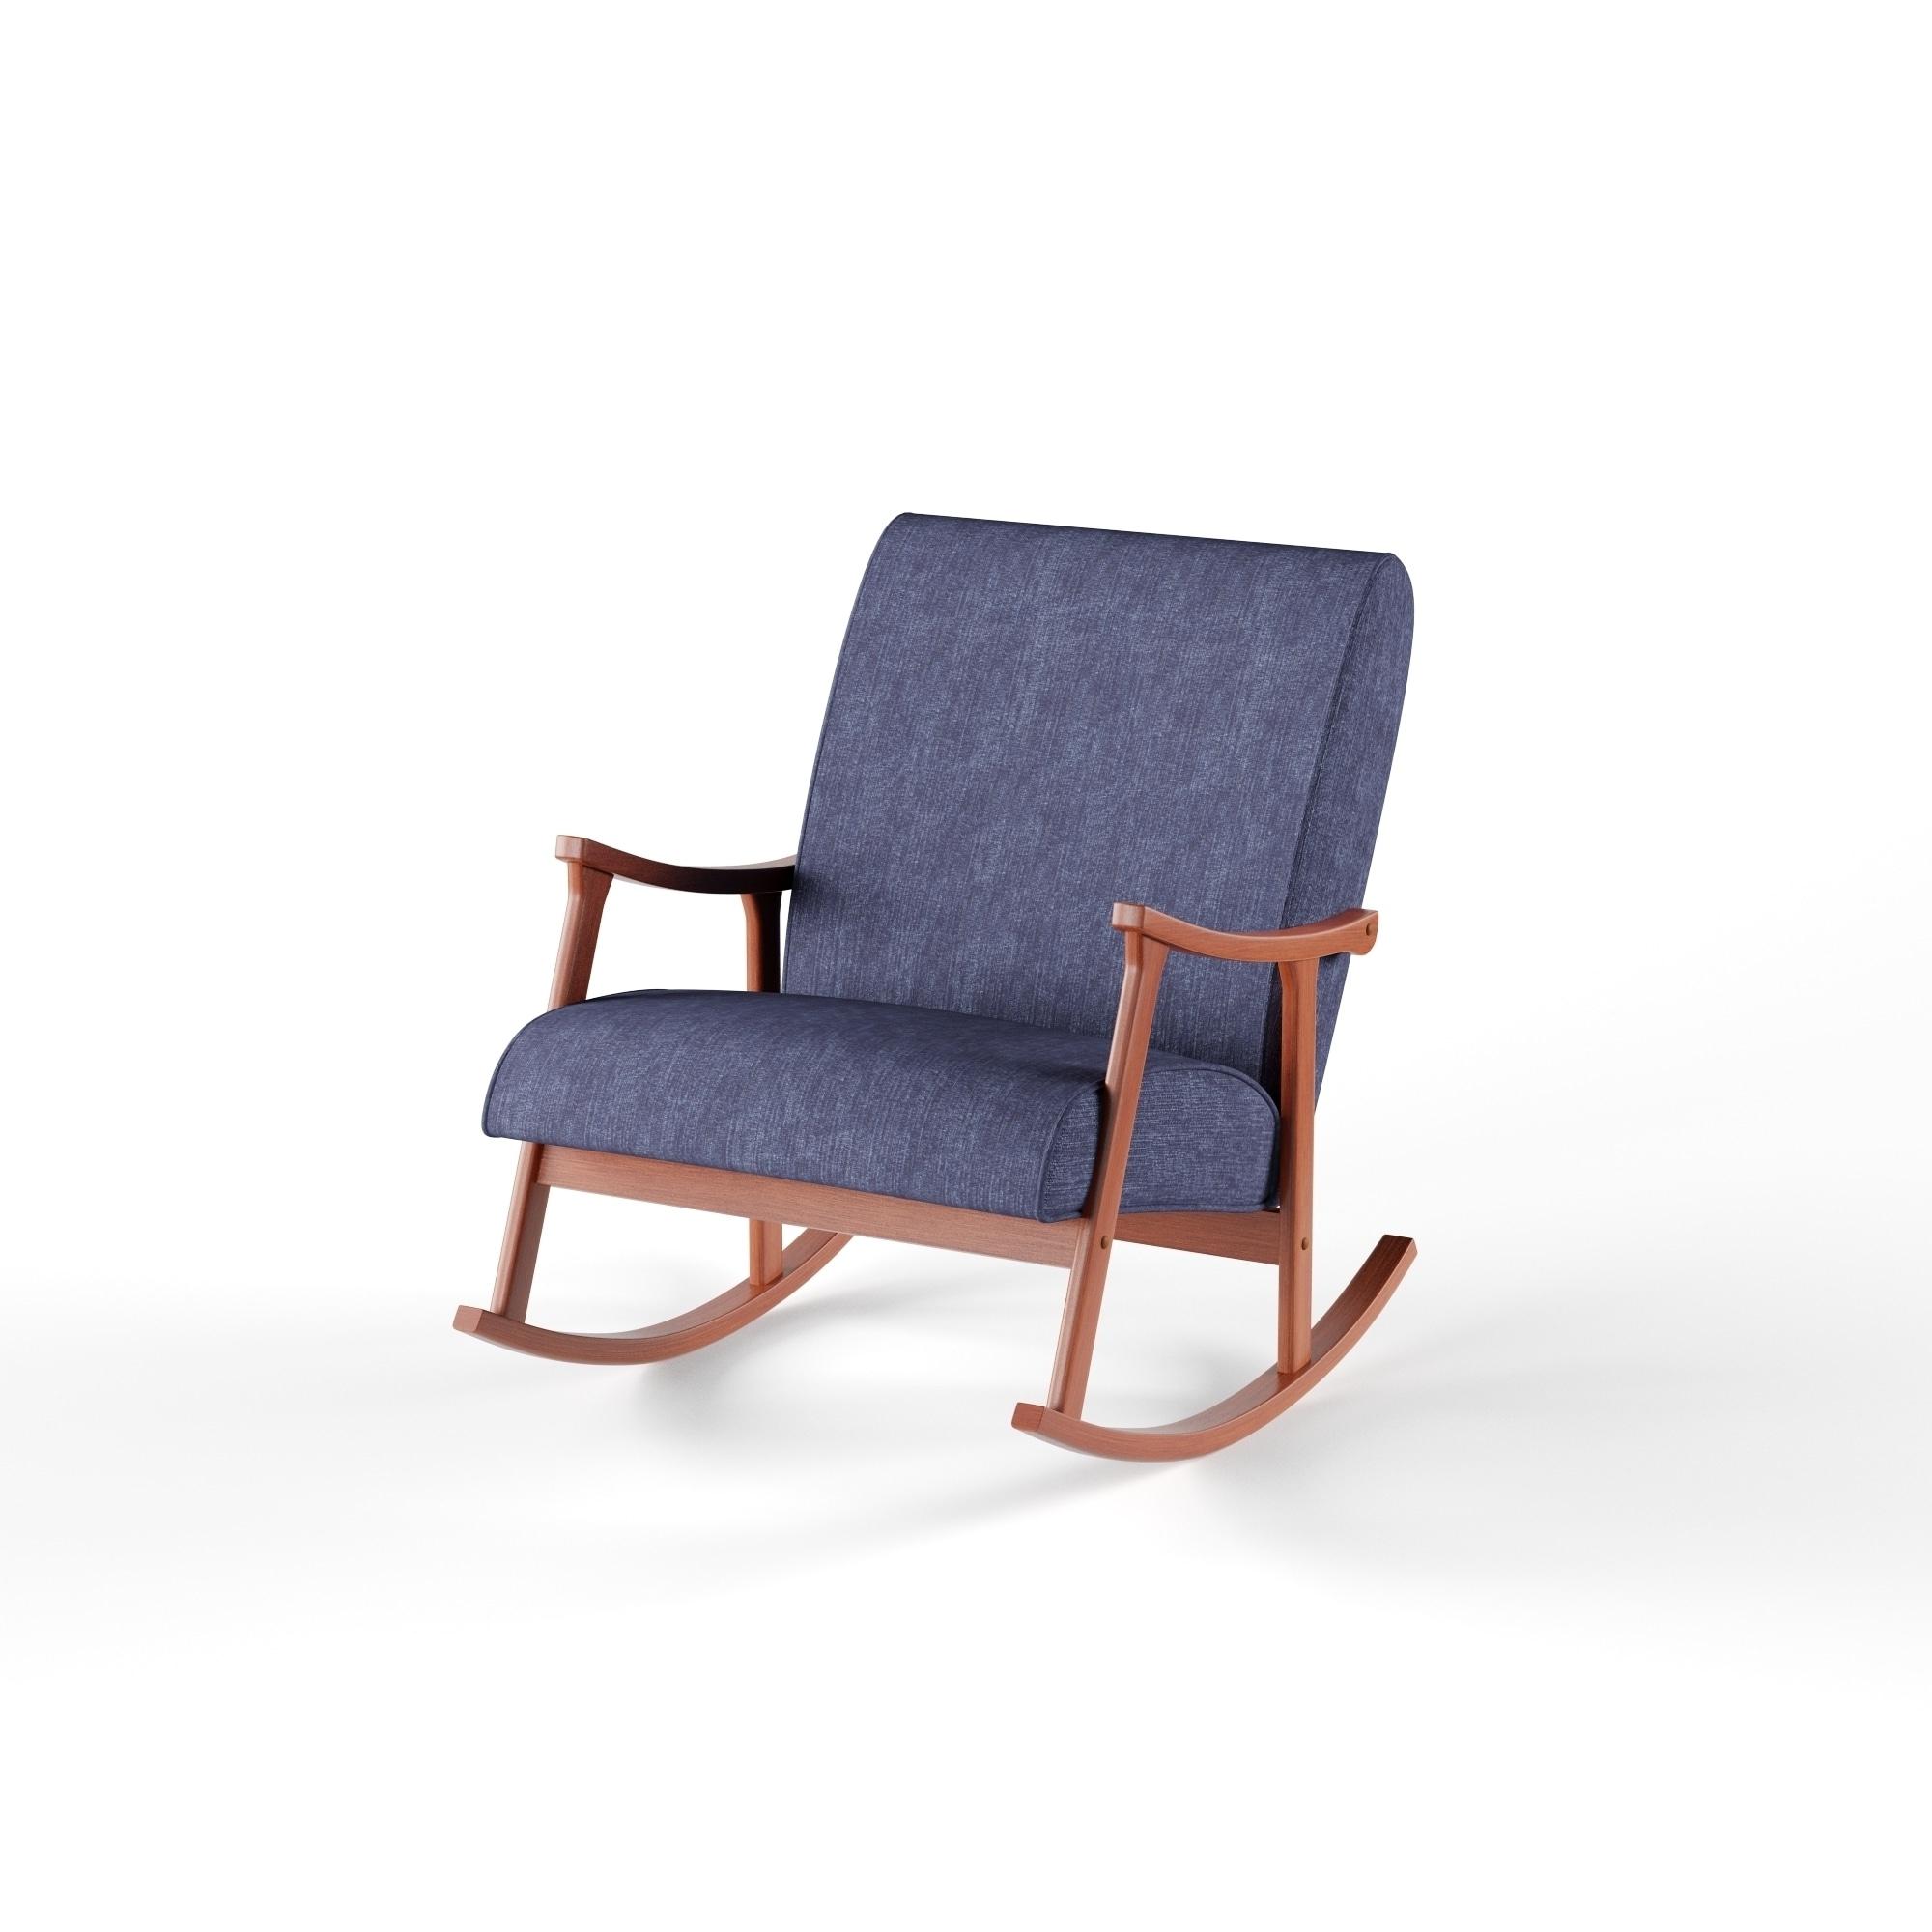 Most Current Shop Carson Carrington Retro Indigo Wooden Rocking Chair – Free Regarding Retro Rocking Chairs (View 8 of 20)